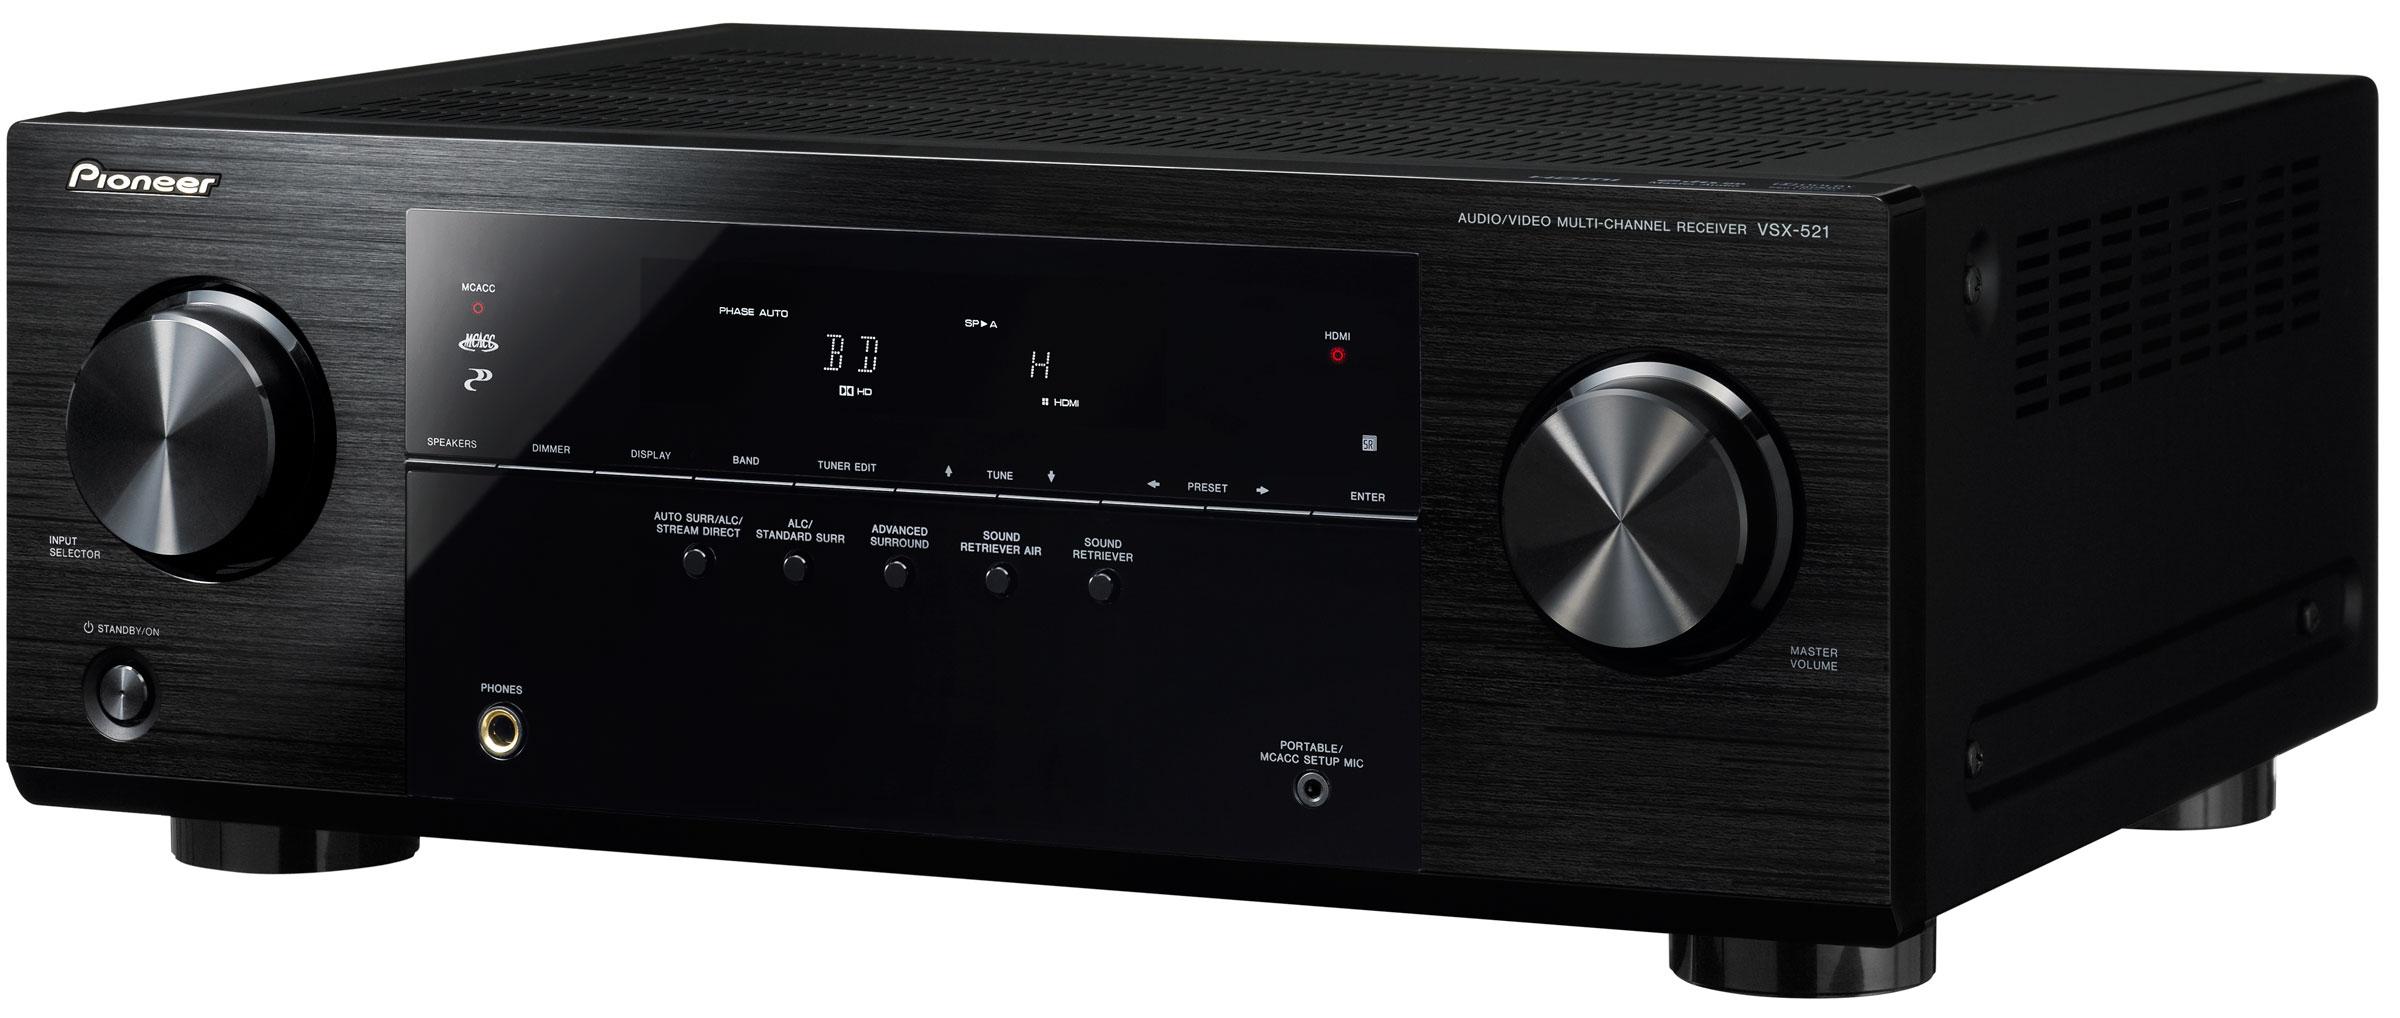 VSX-521 - Pioneer VSX-521 - Audiofanzine